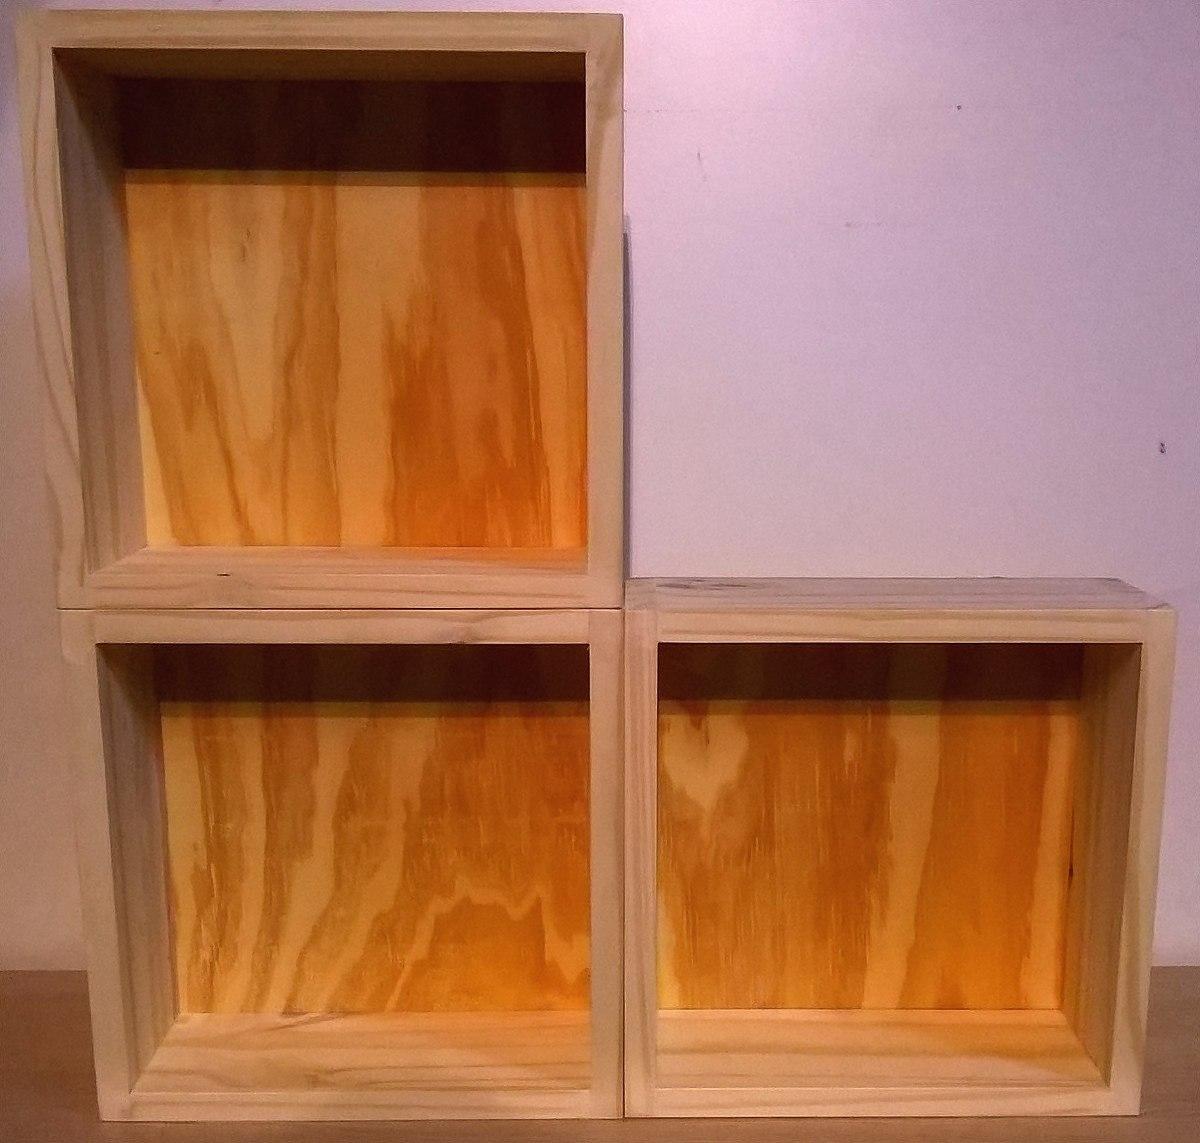 Estanteria fondo 20 cm free libreria xx cm madera y metal - Cubos de madera ...